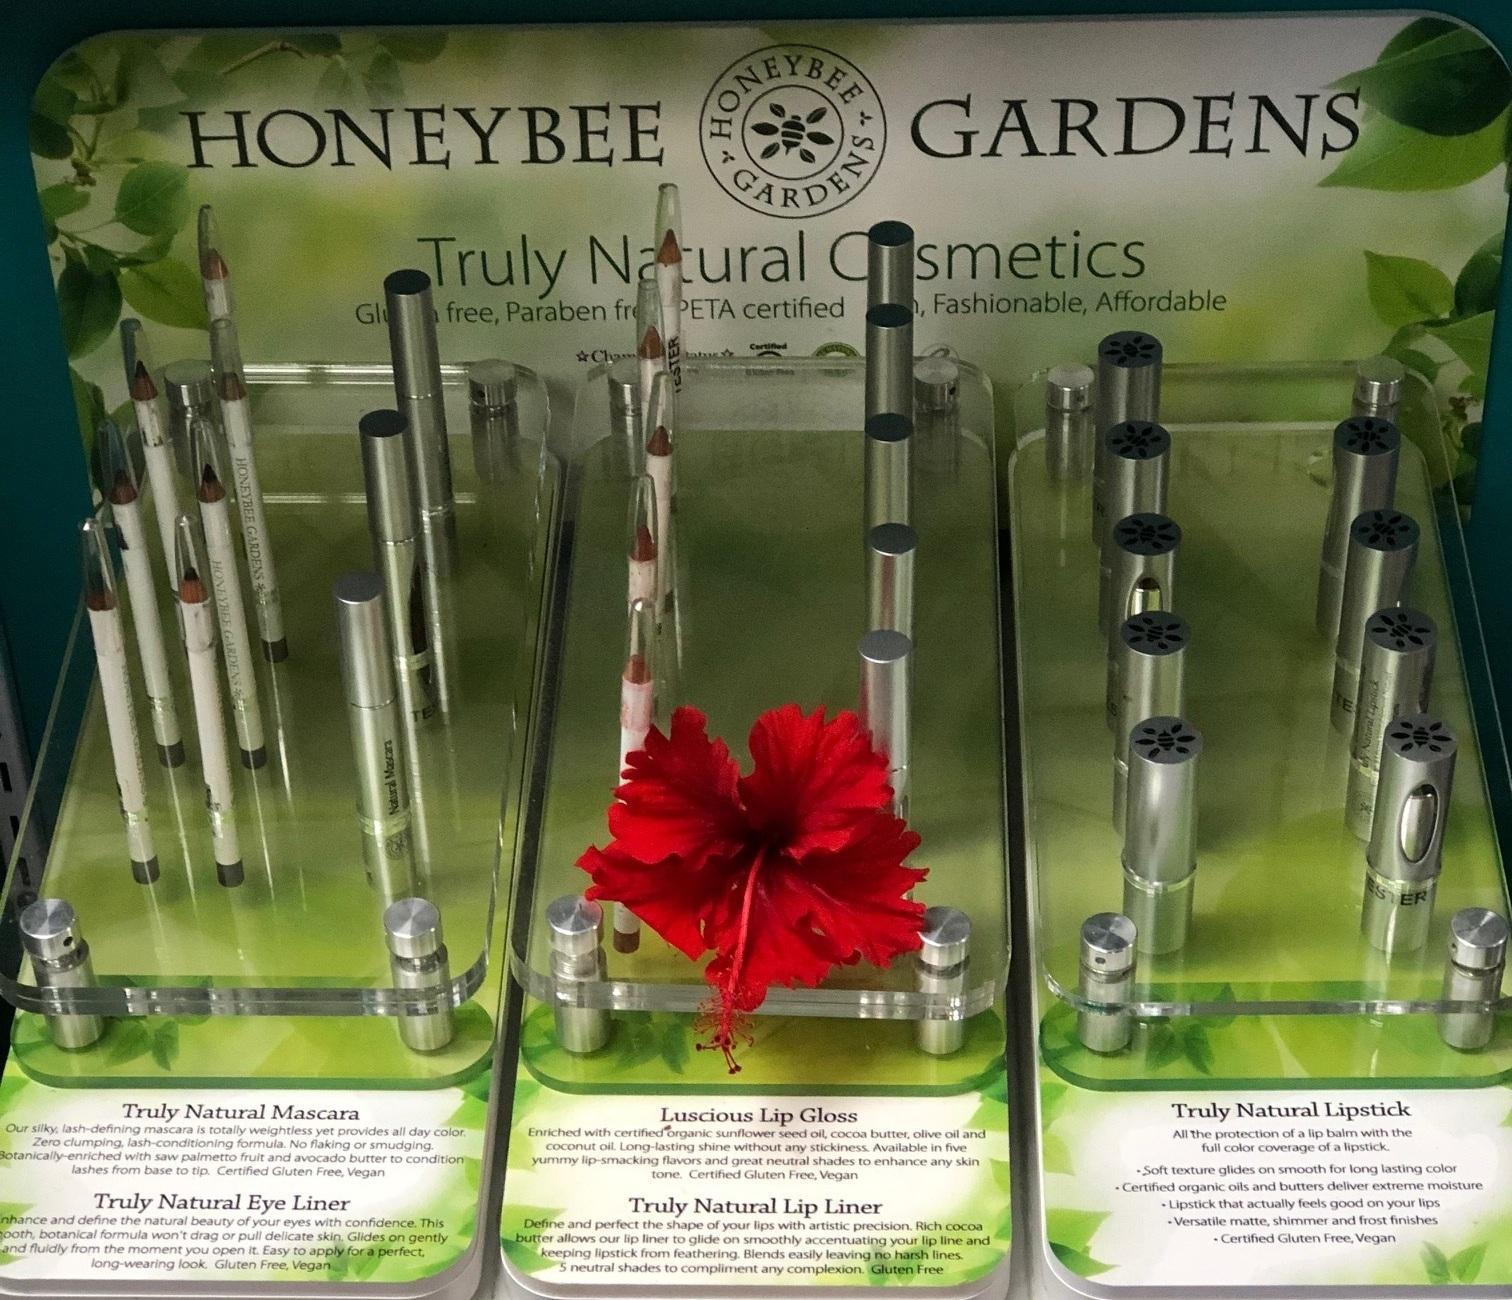 Honeybee%2BGardens.jpg